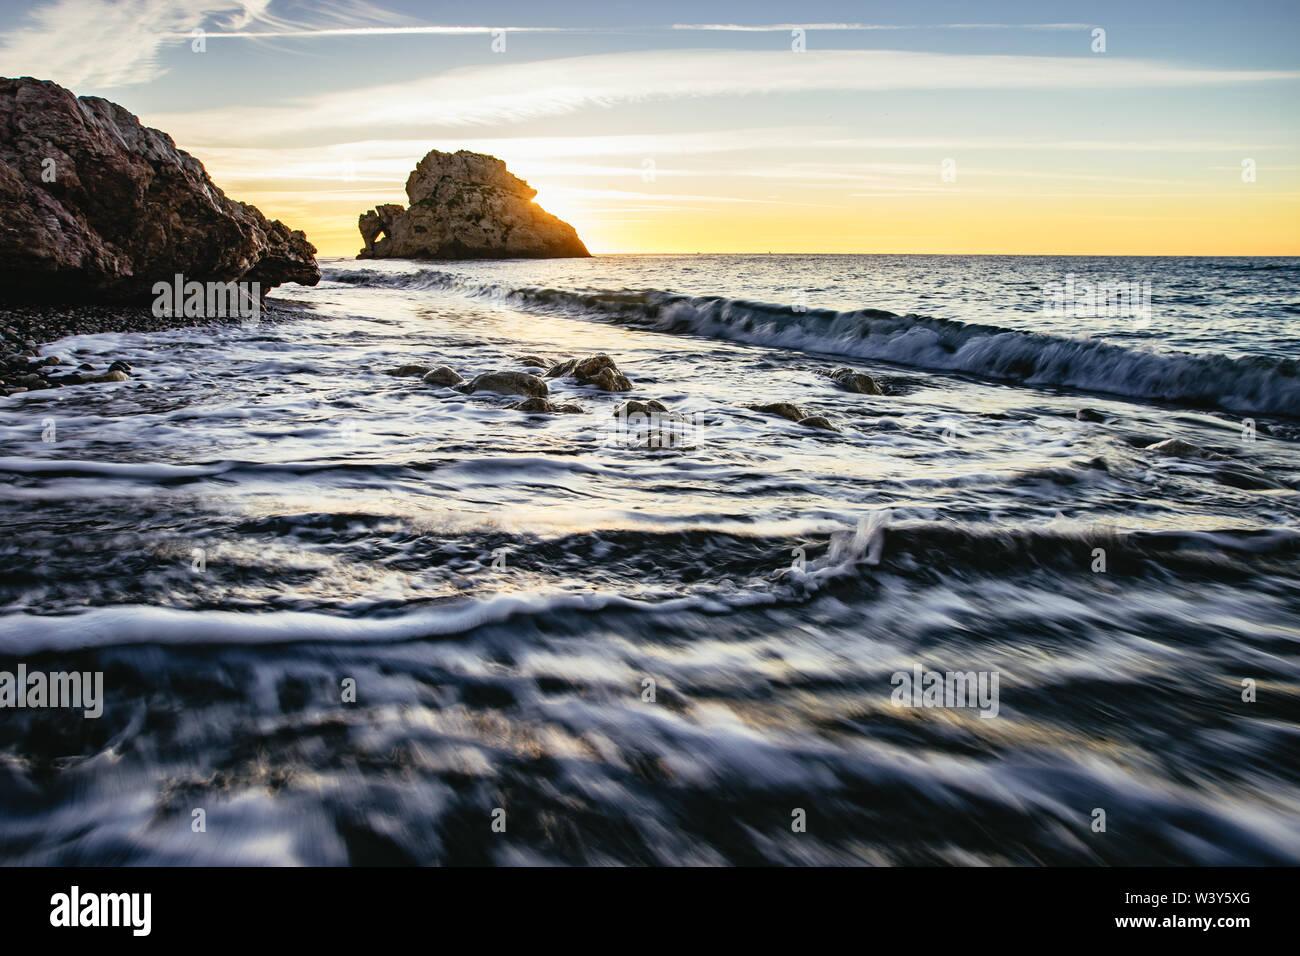 Orange sunset over a calm ocean, Malaga Beach - Stock Image